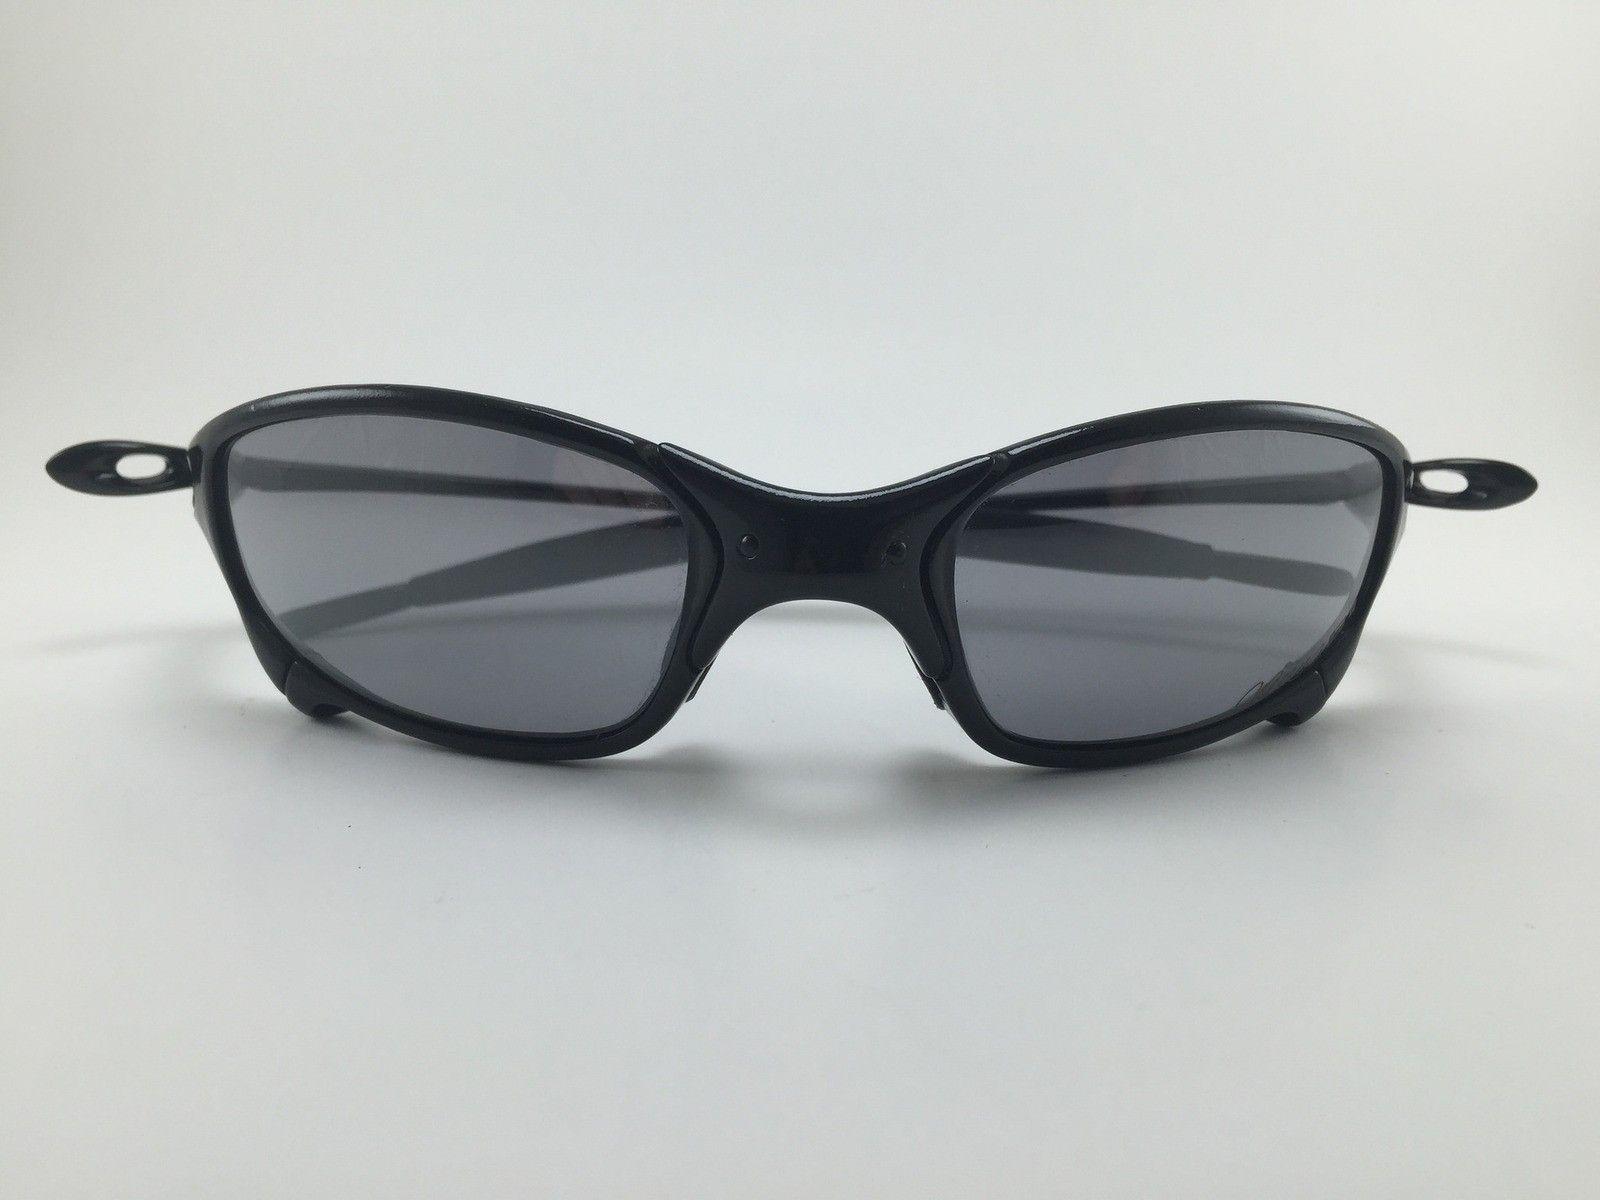 $OLD - Custom Gloss Black Juliet with Ichiro Slate Lenses - 15875719484_8adbb3214f_k.jpg